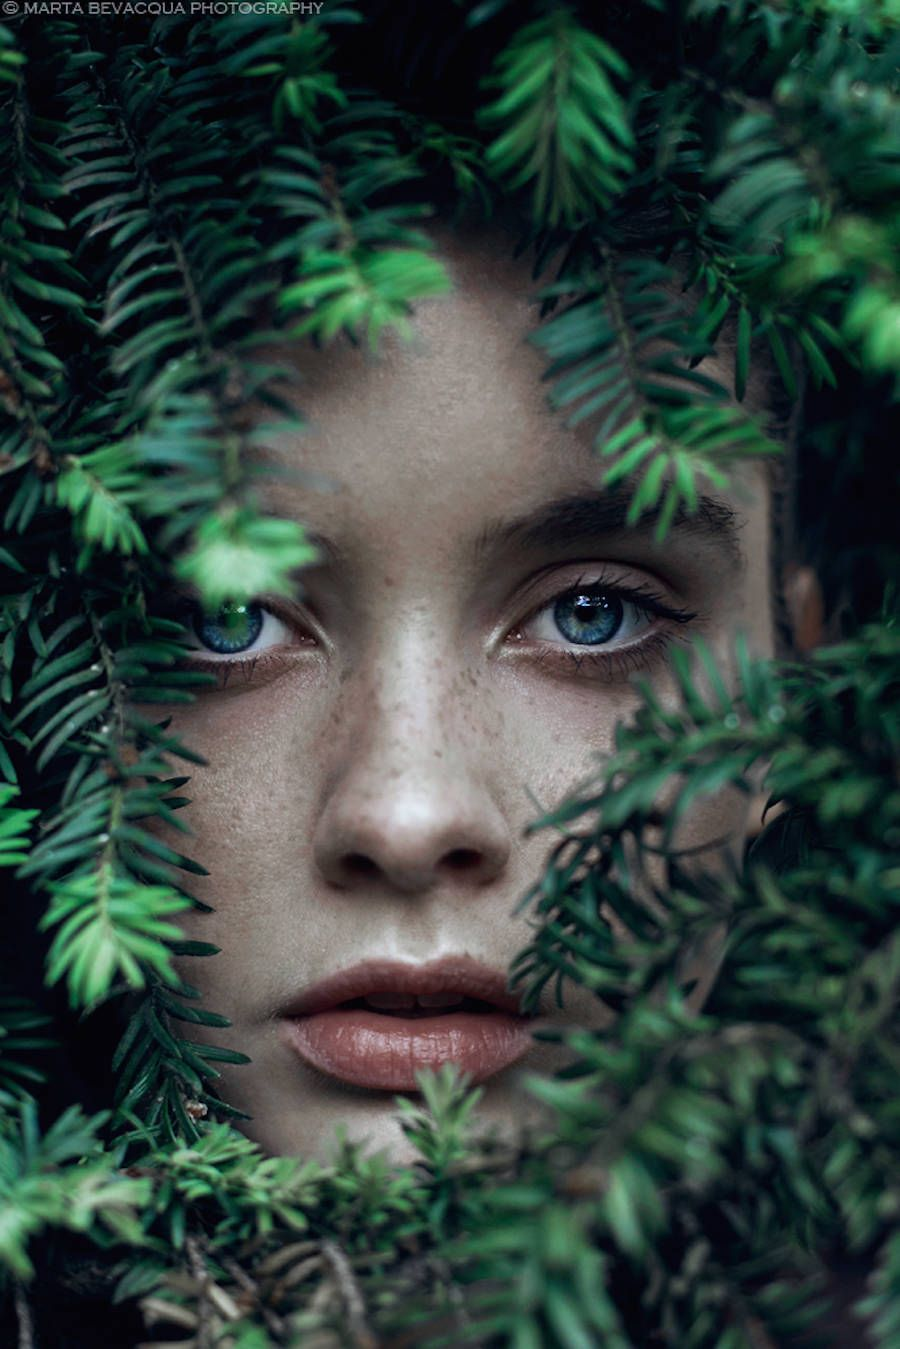 Artistic girl photography by marta bevacqua portrait